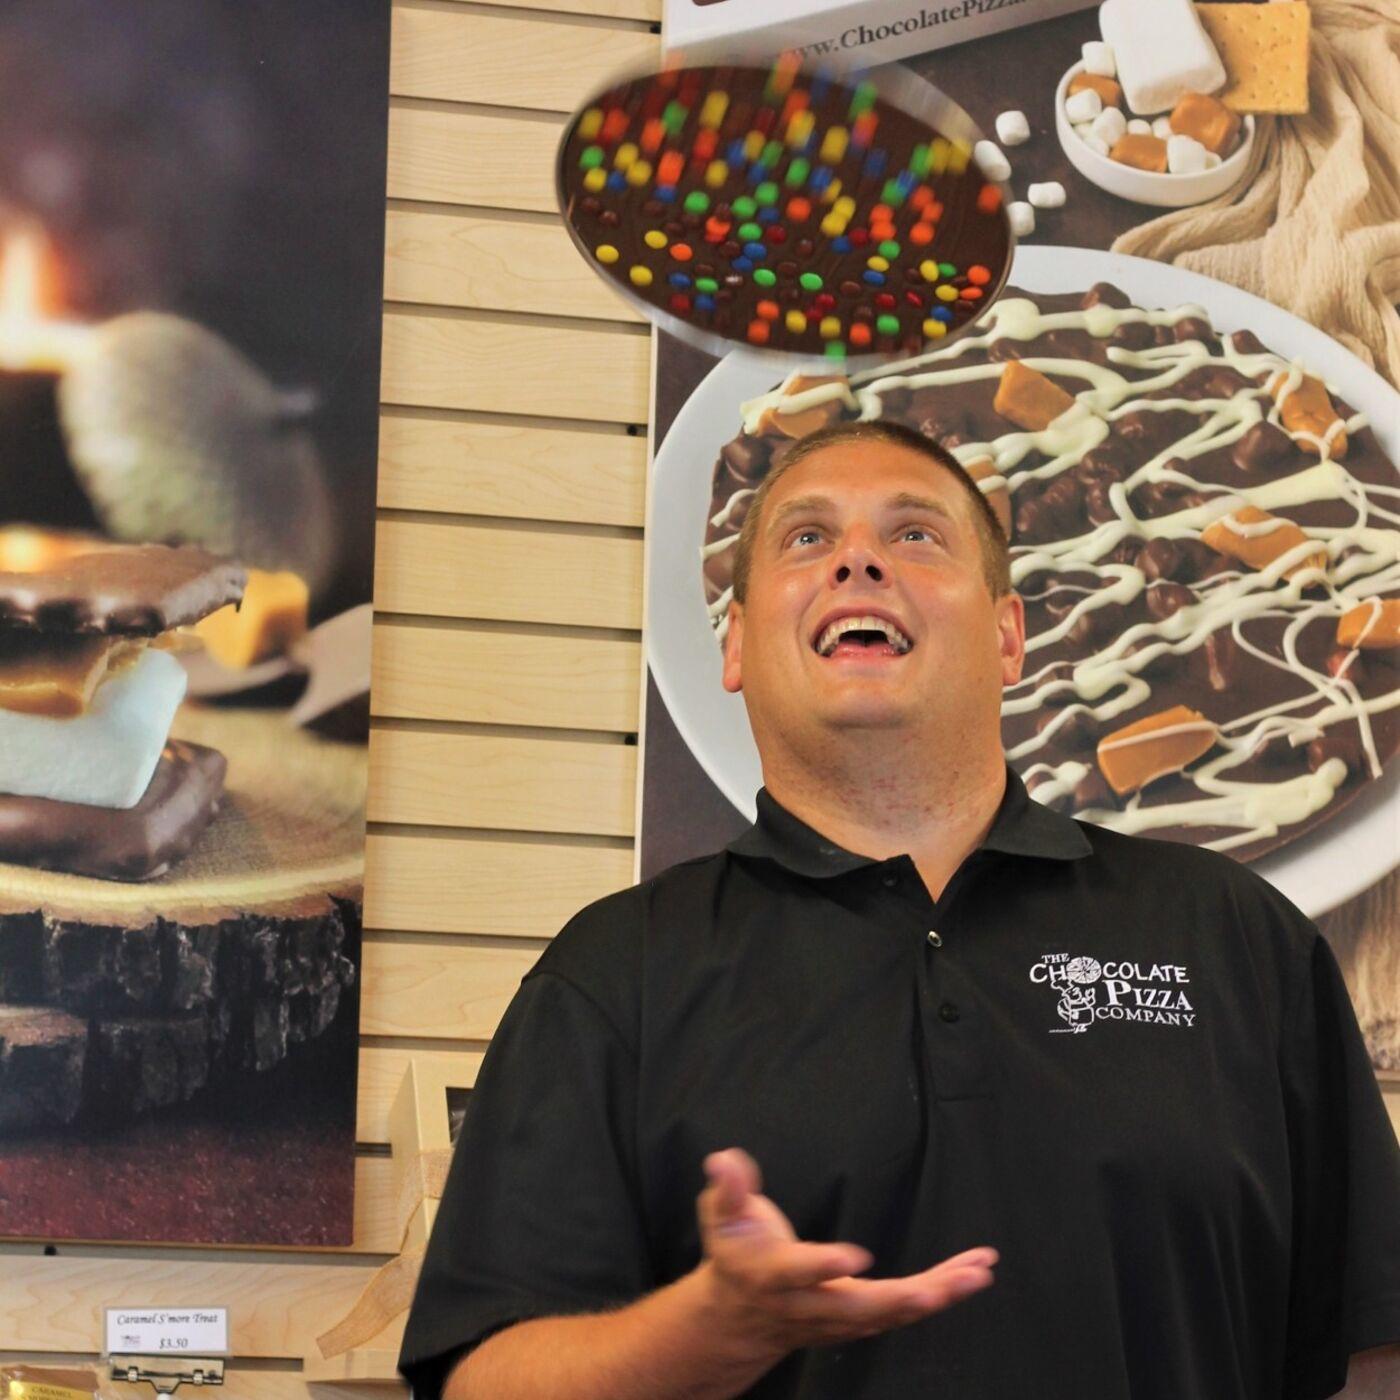 Ryan Novak of Chocolate Pizza Company